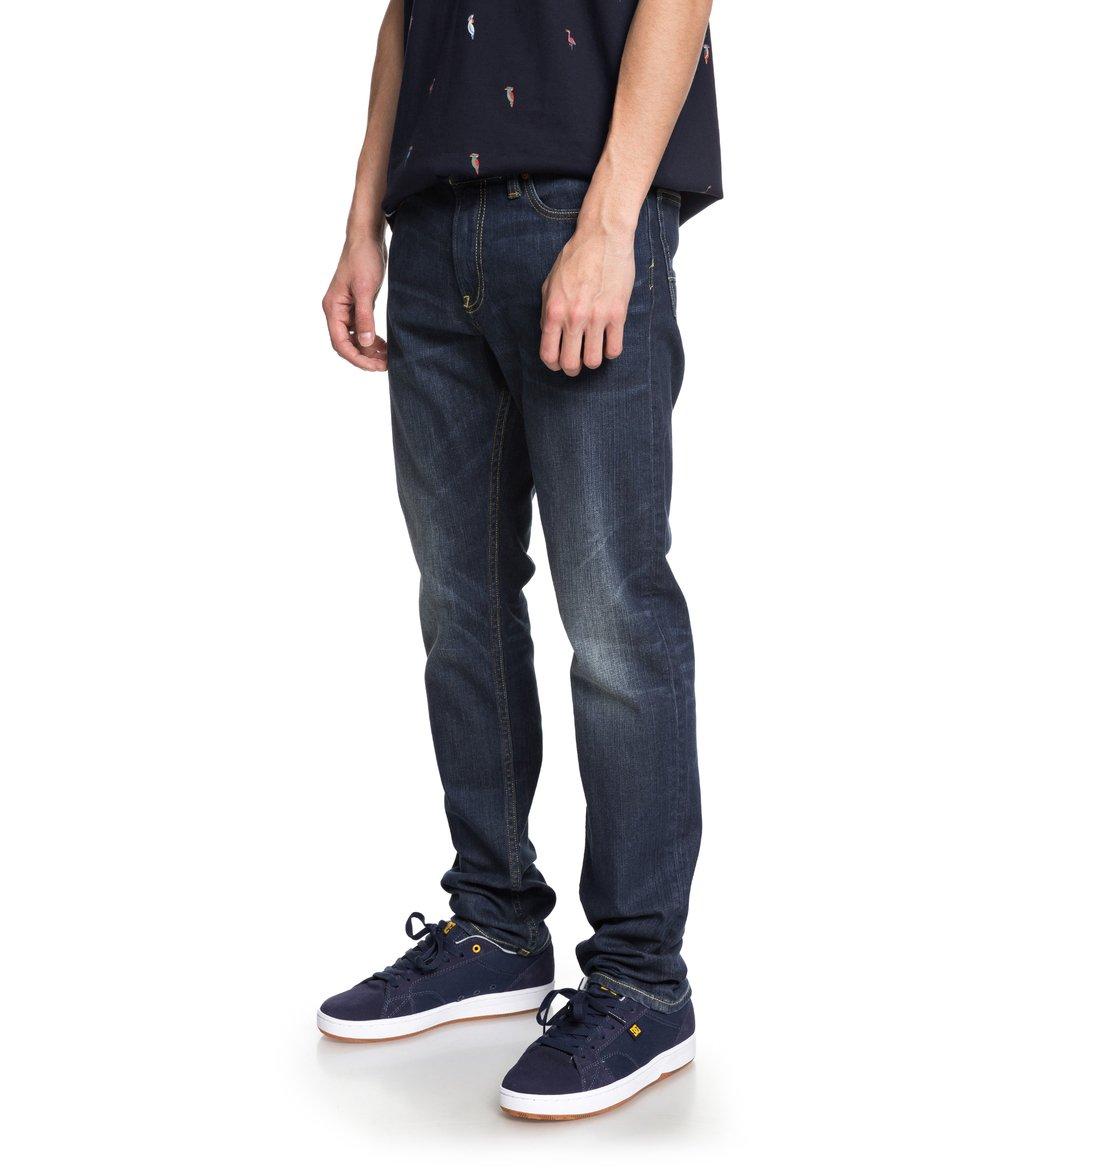 dc shoes Worker Medium Stone - Jeans Vestibilità Slim da Uomo - Blue - DC Shoes